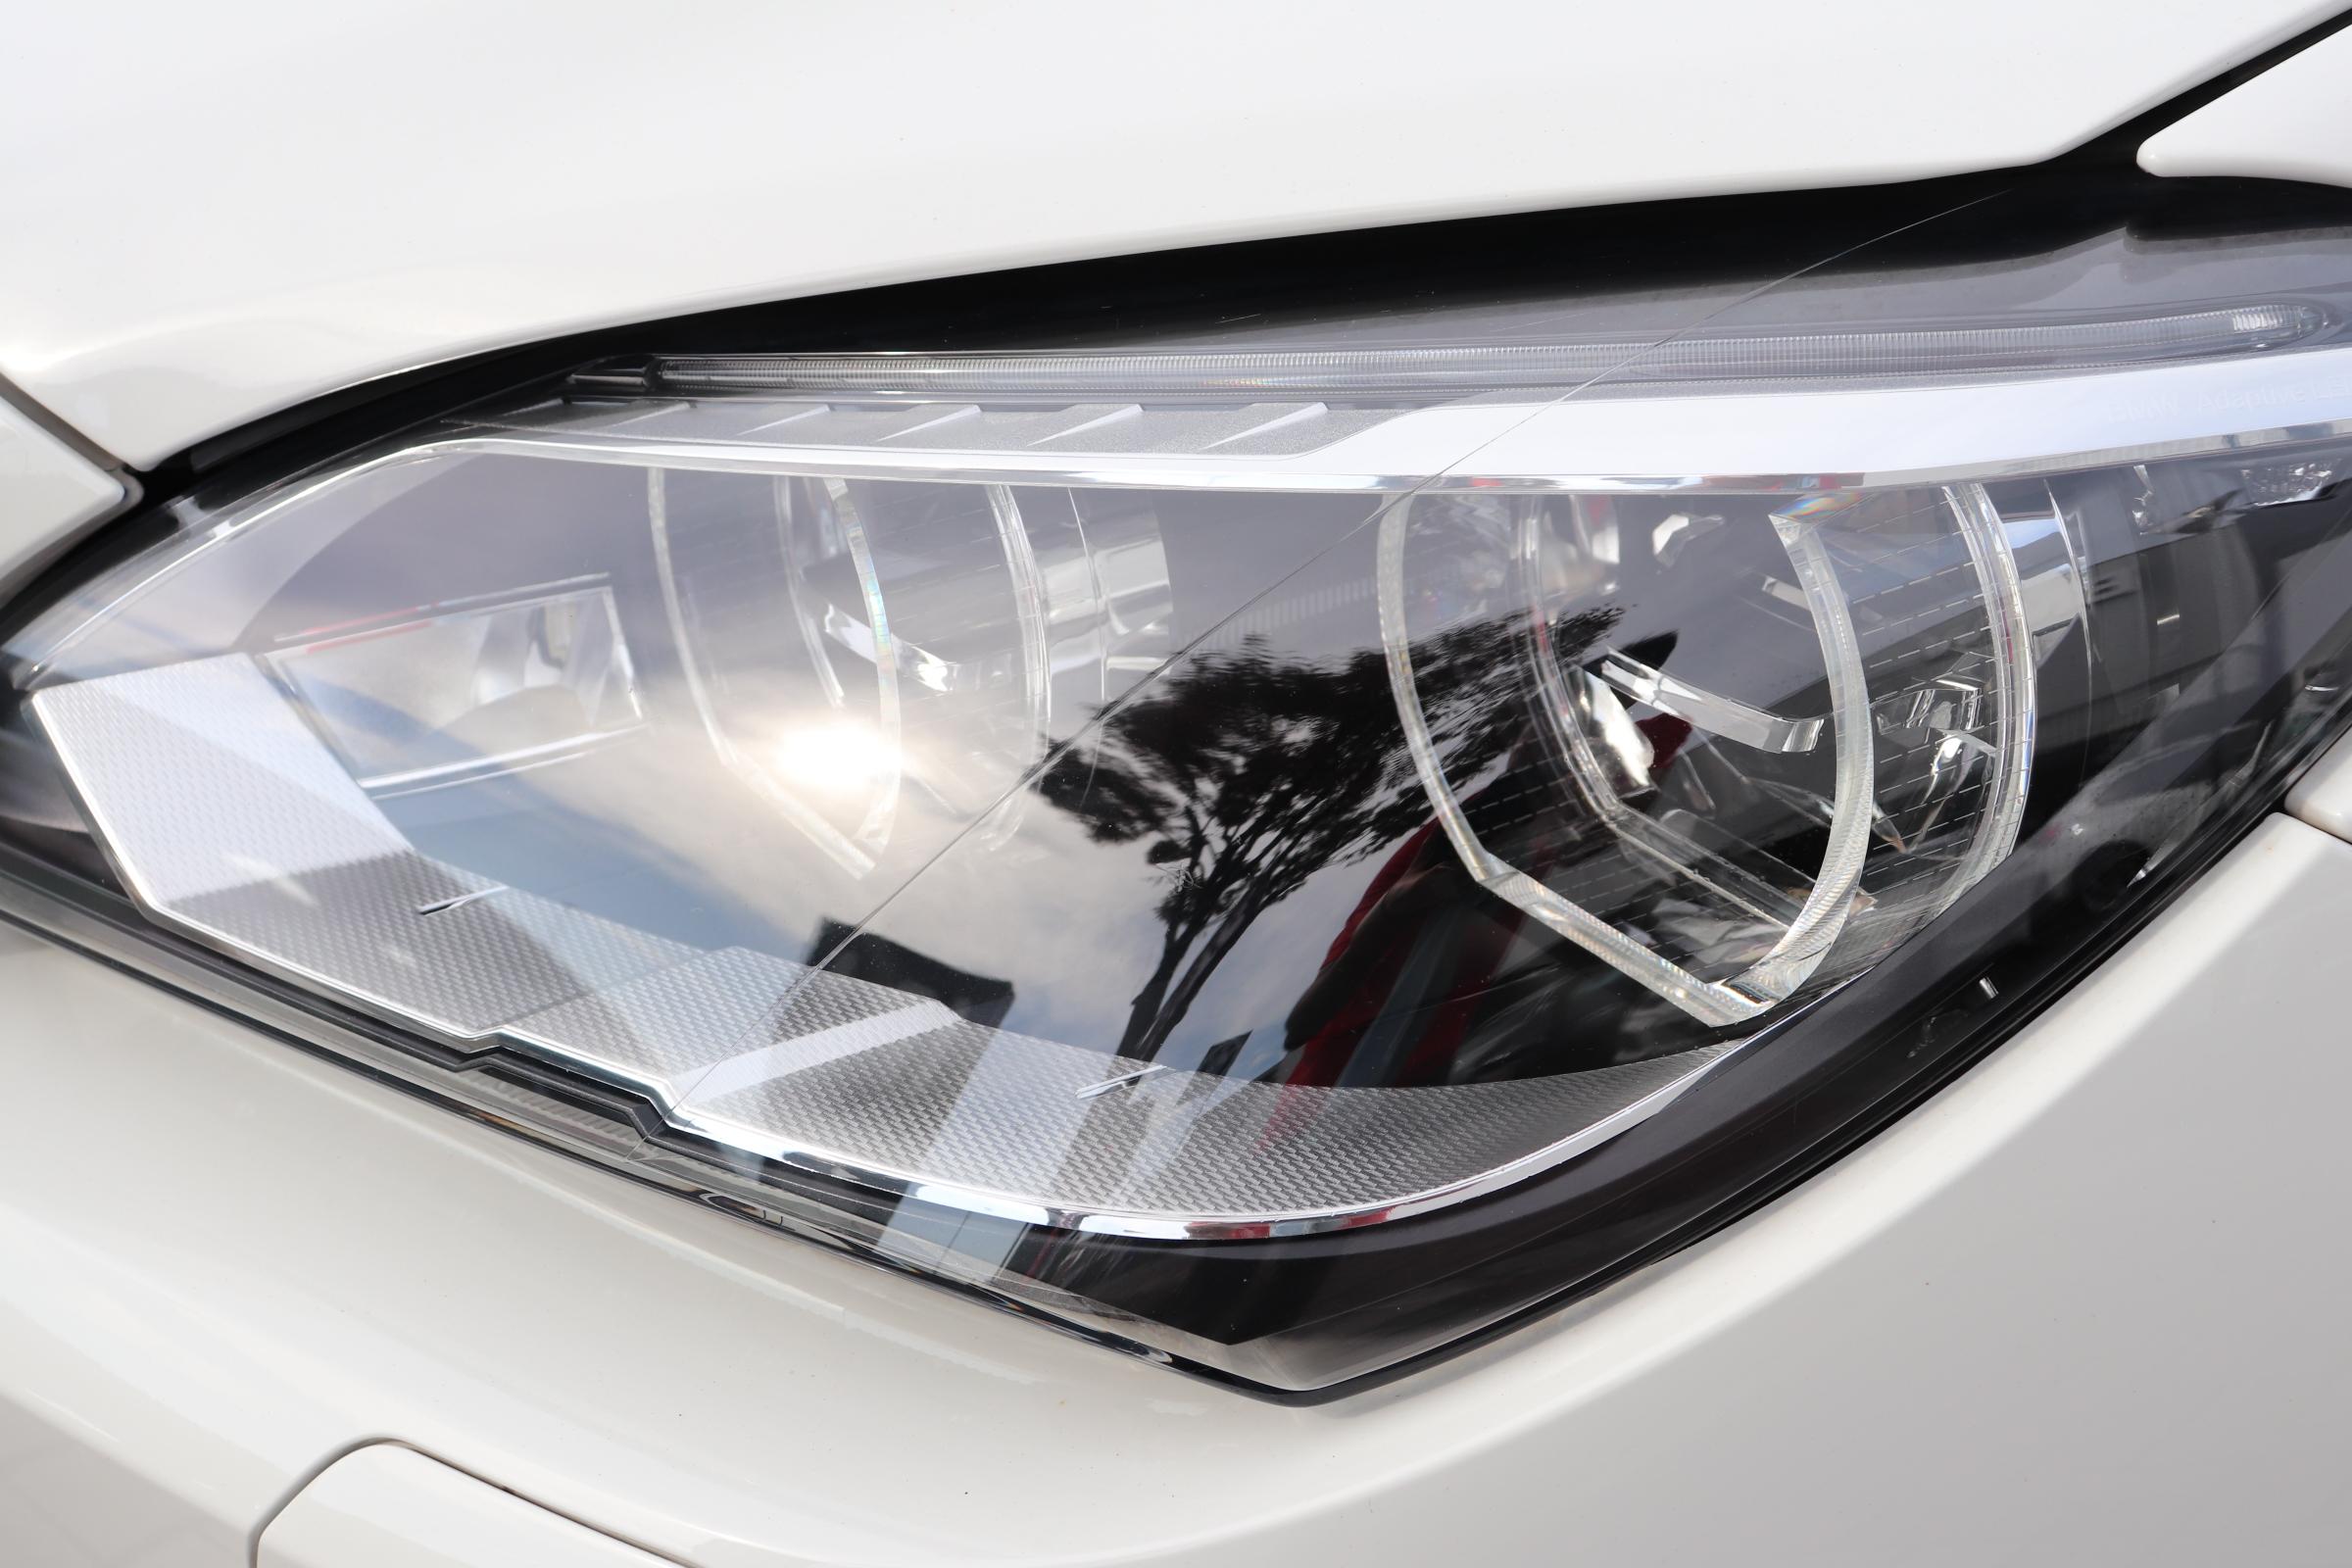 640iグランクーペ BEAMコンプリートカー コンフォートパッケージ LEDヘッドライト SR 白革 ワンオーナー車両画像10